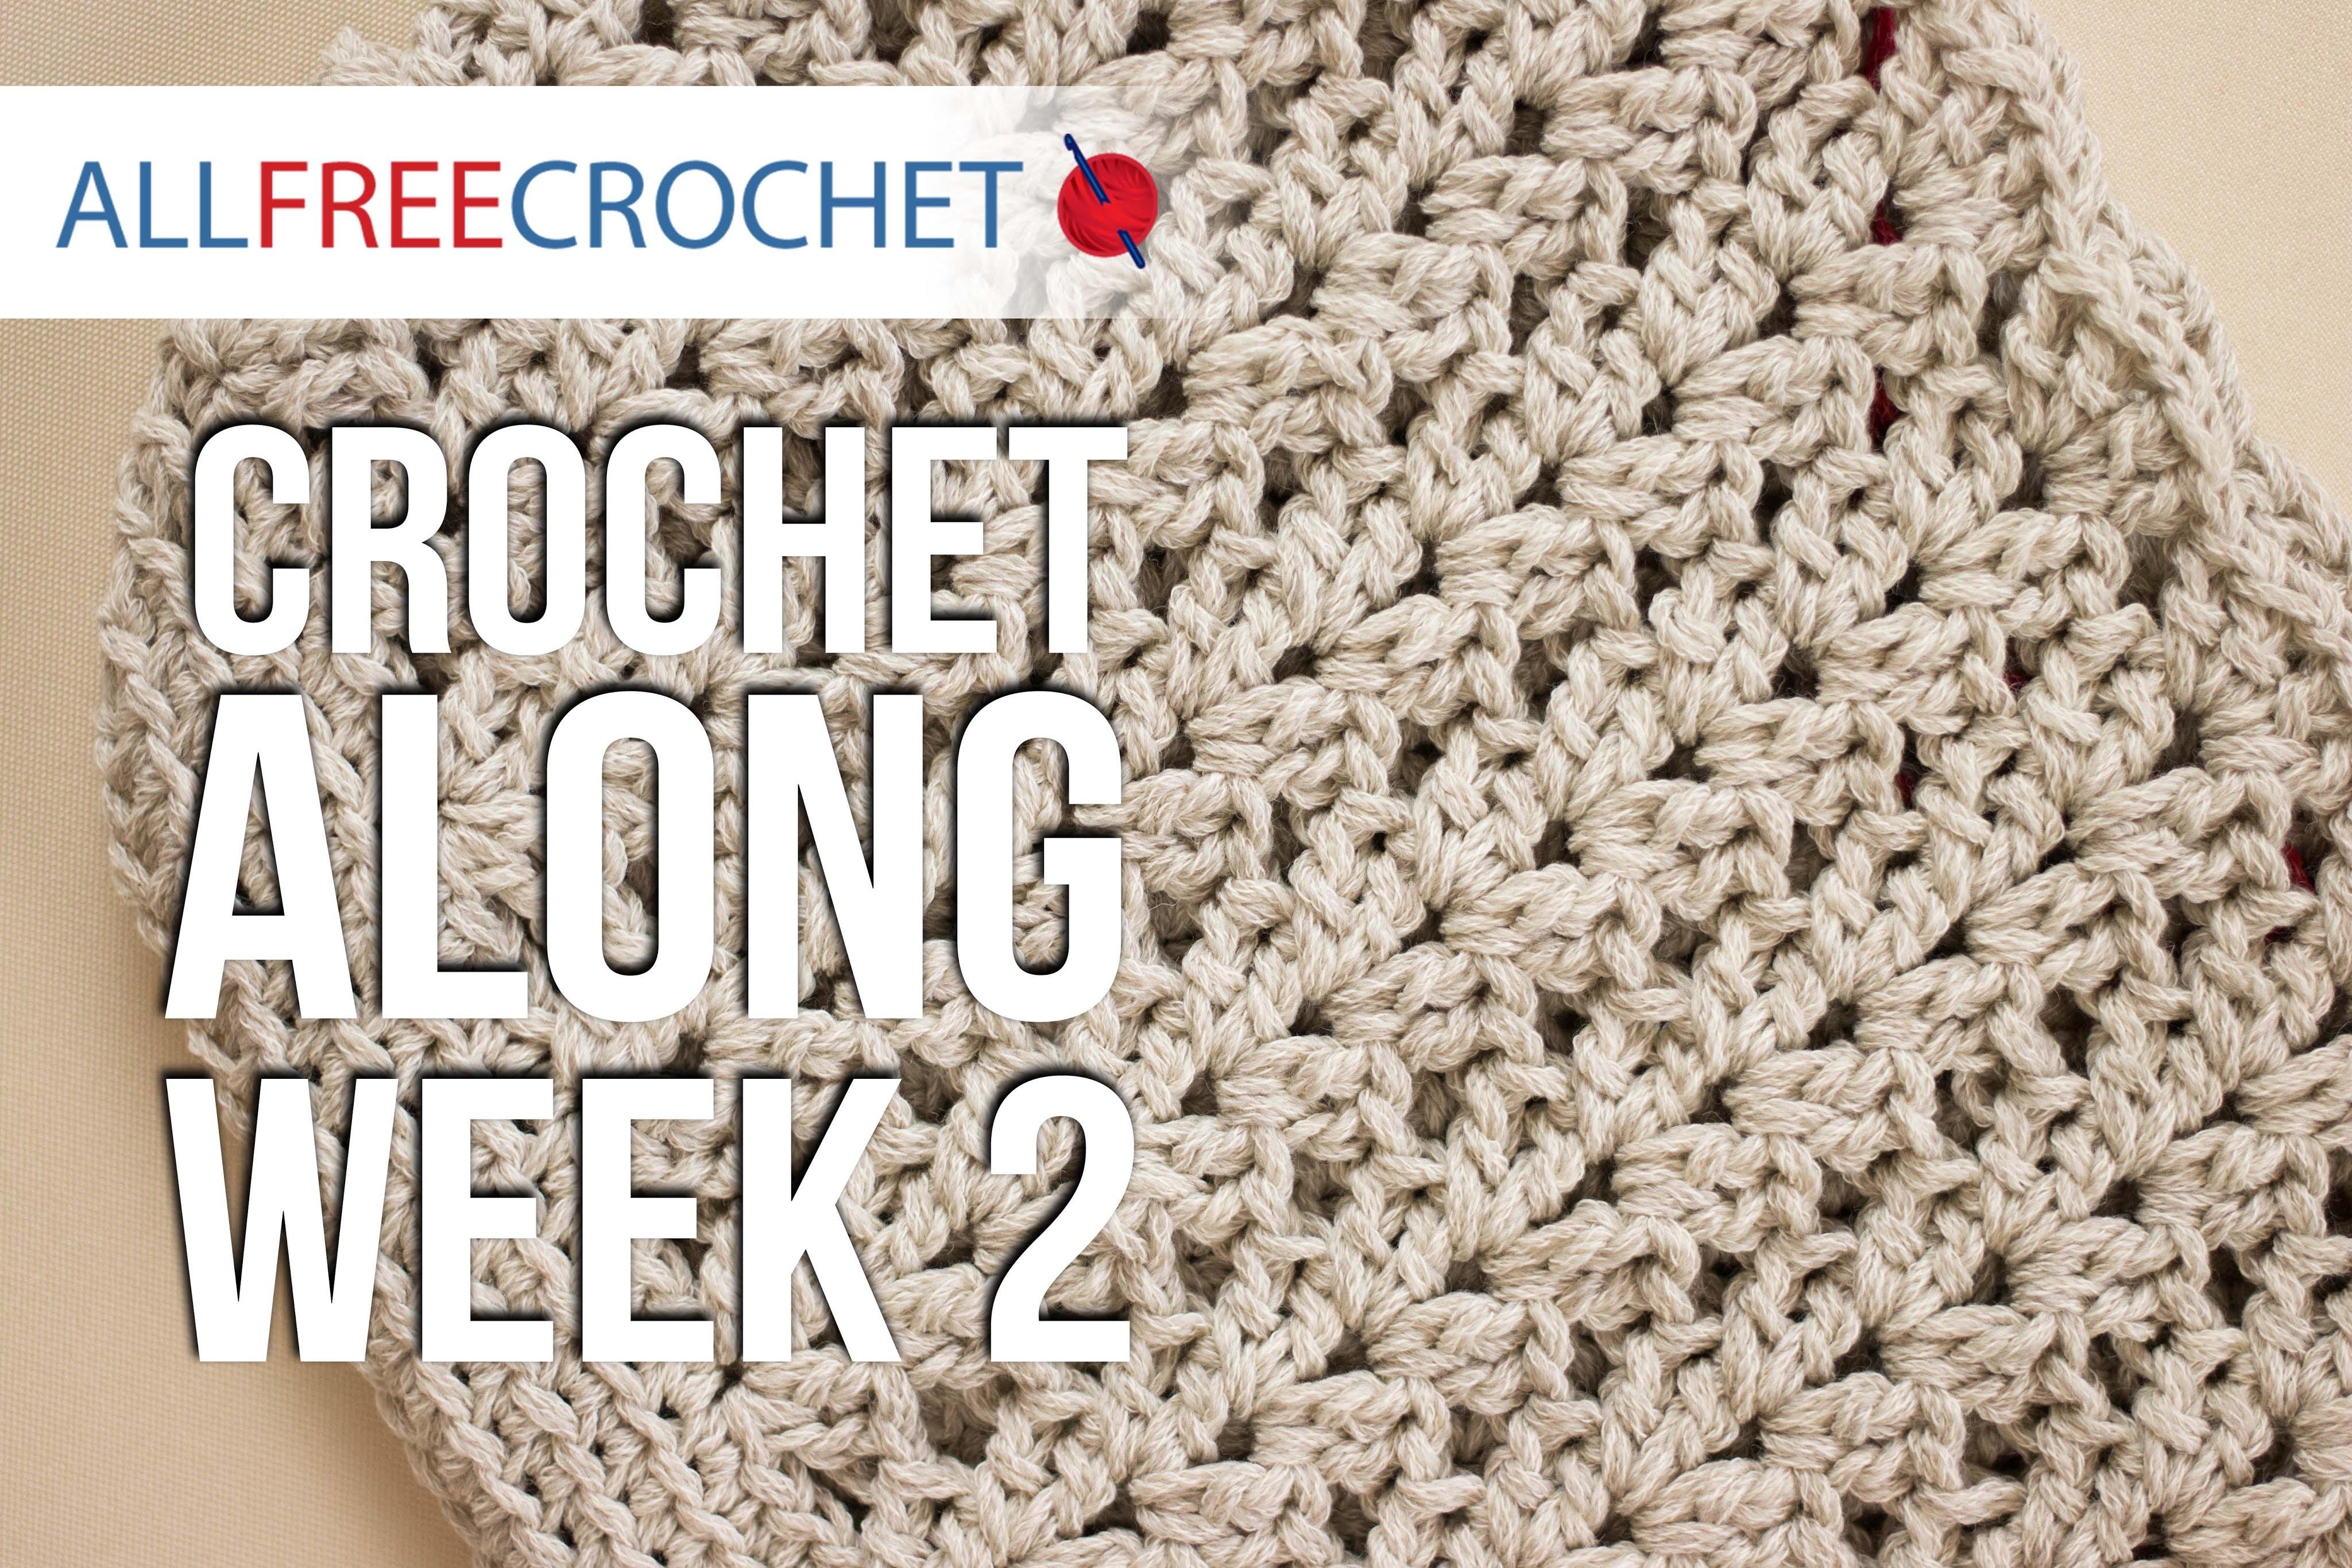 Crochet Along: Week 2 - Sides of the Bag